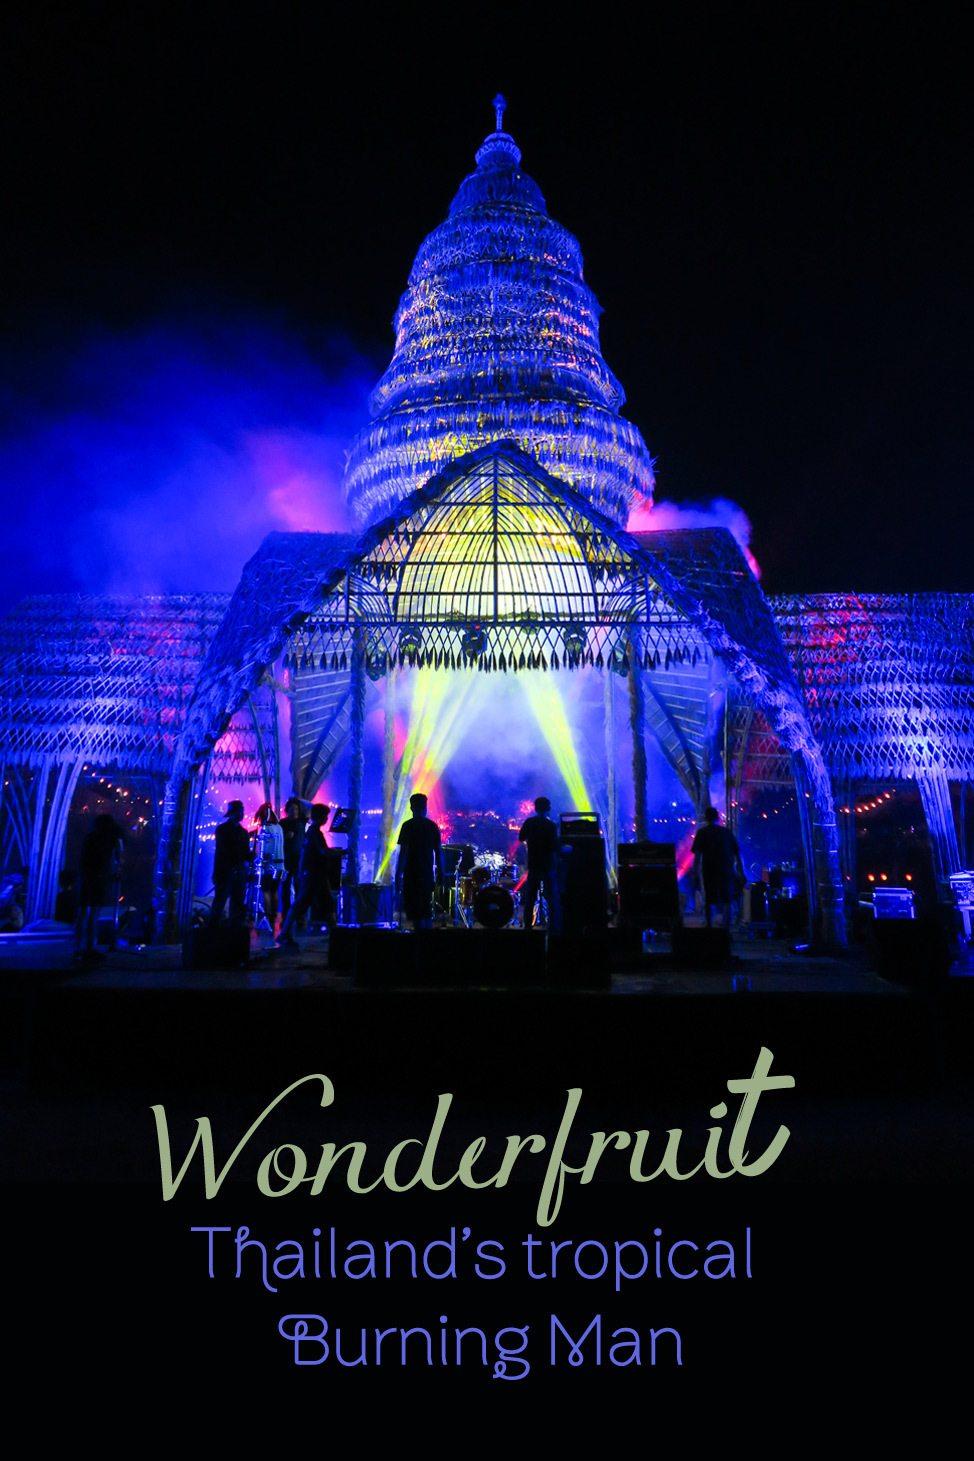 Wonderfruit • Thailand's Tropical Burning Man